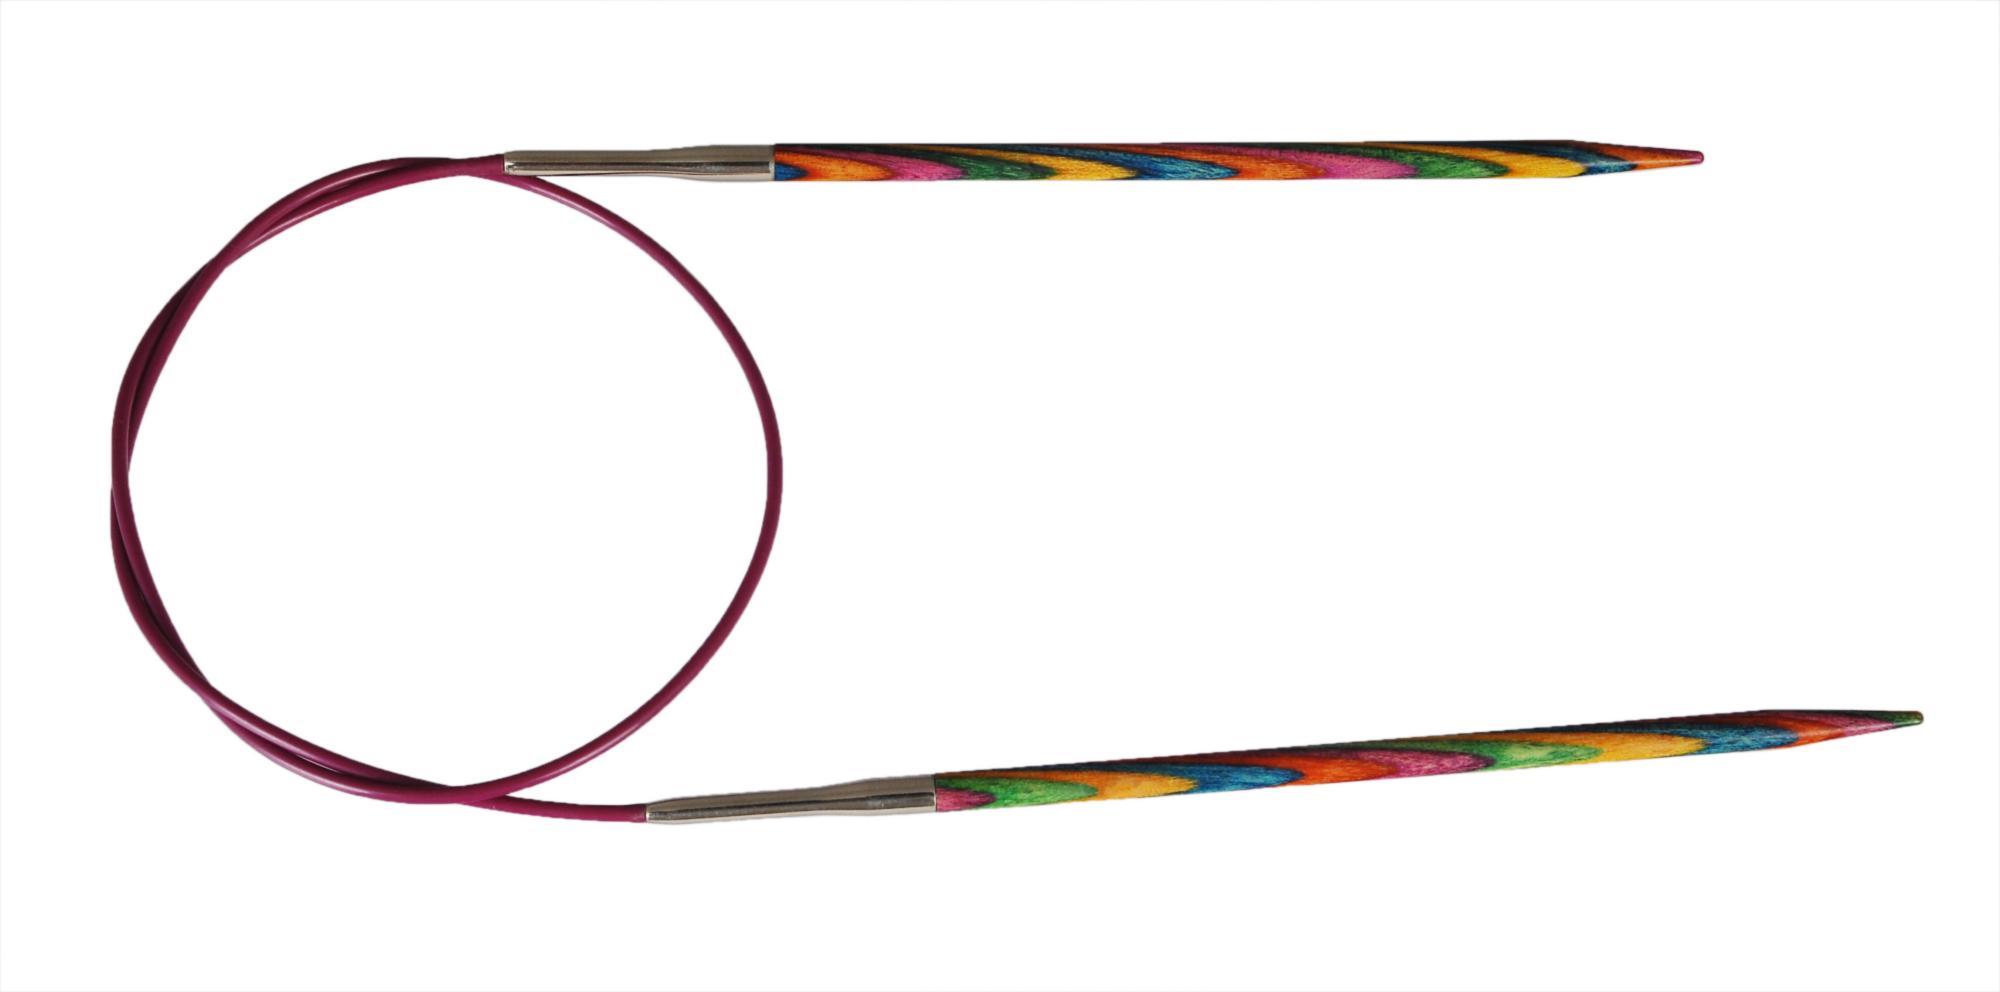 Спицы круговые 120 см Symfonie Wood KnitPro, 21367, 4.00 мм